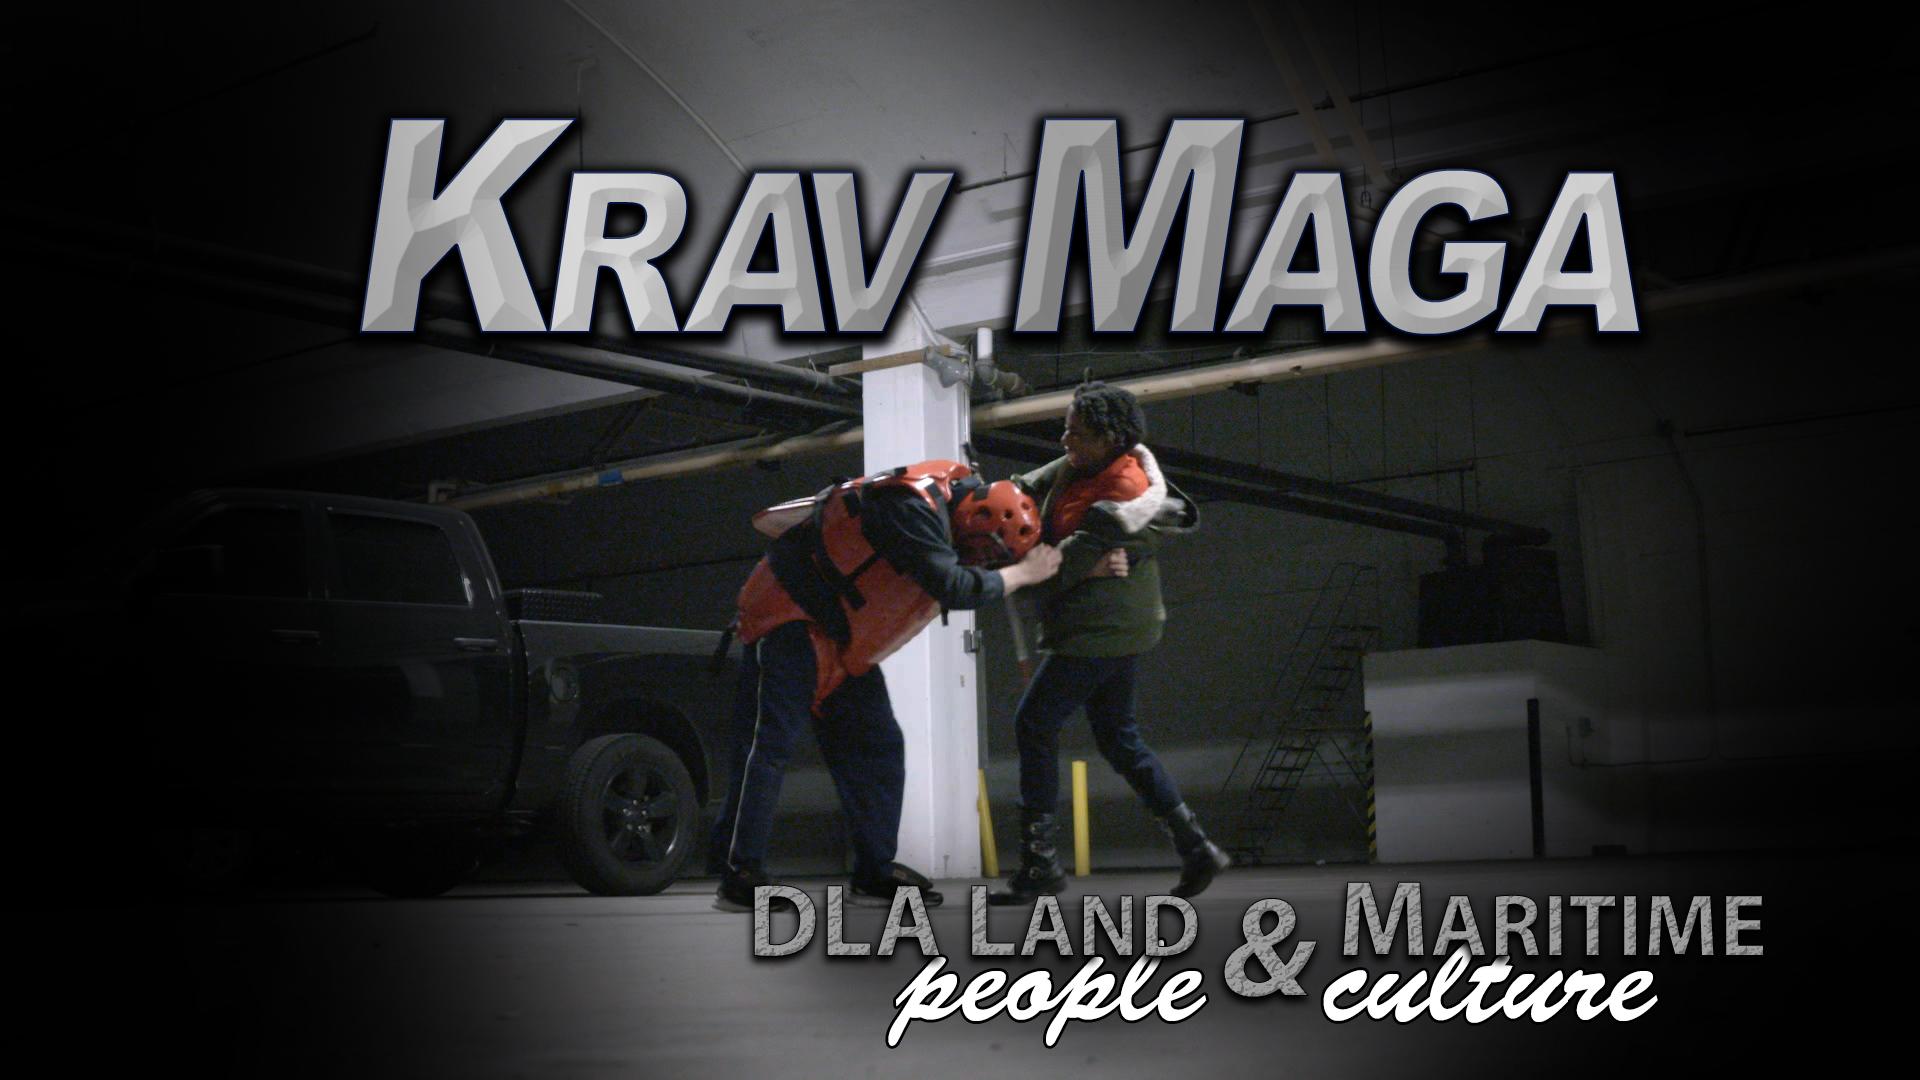 Krav Maga Class - May 24 > Defense Logistics Agency > News